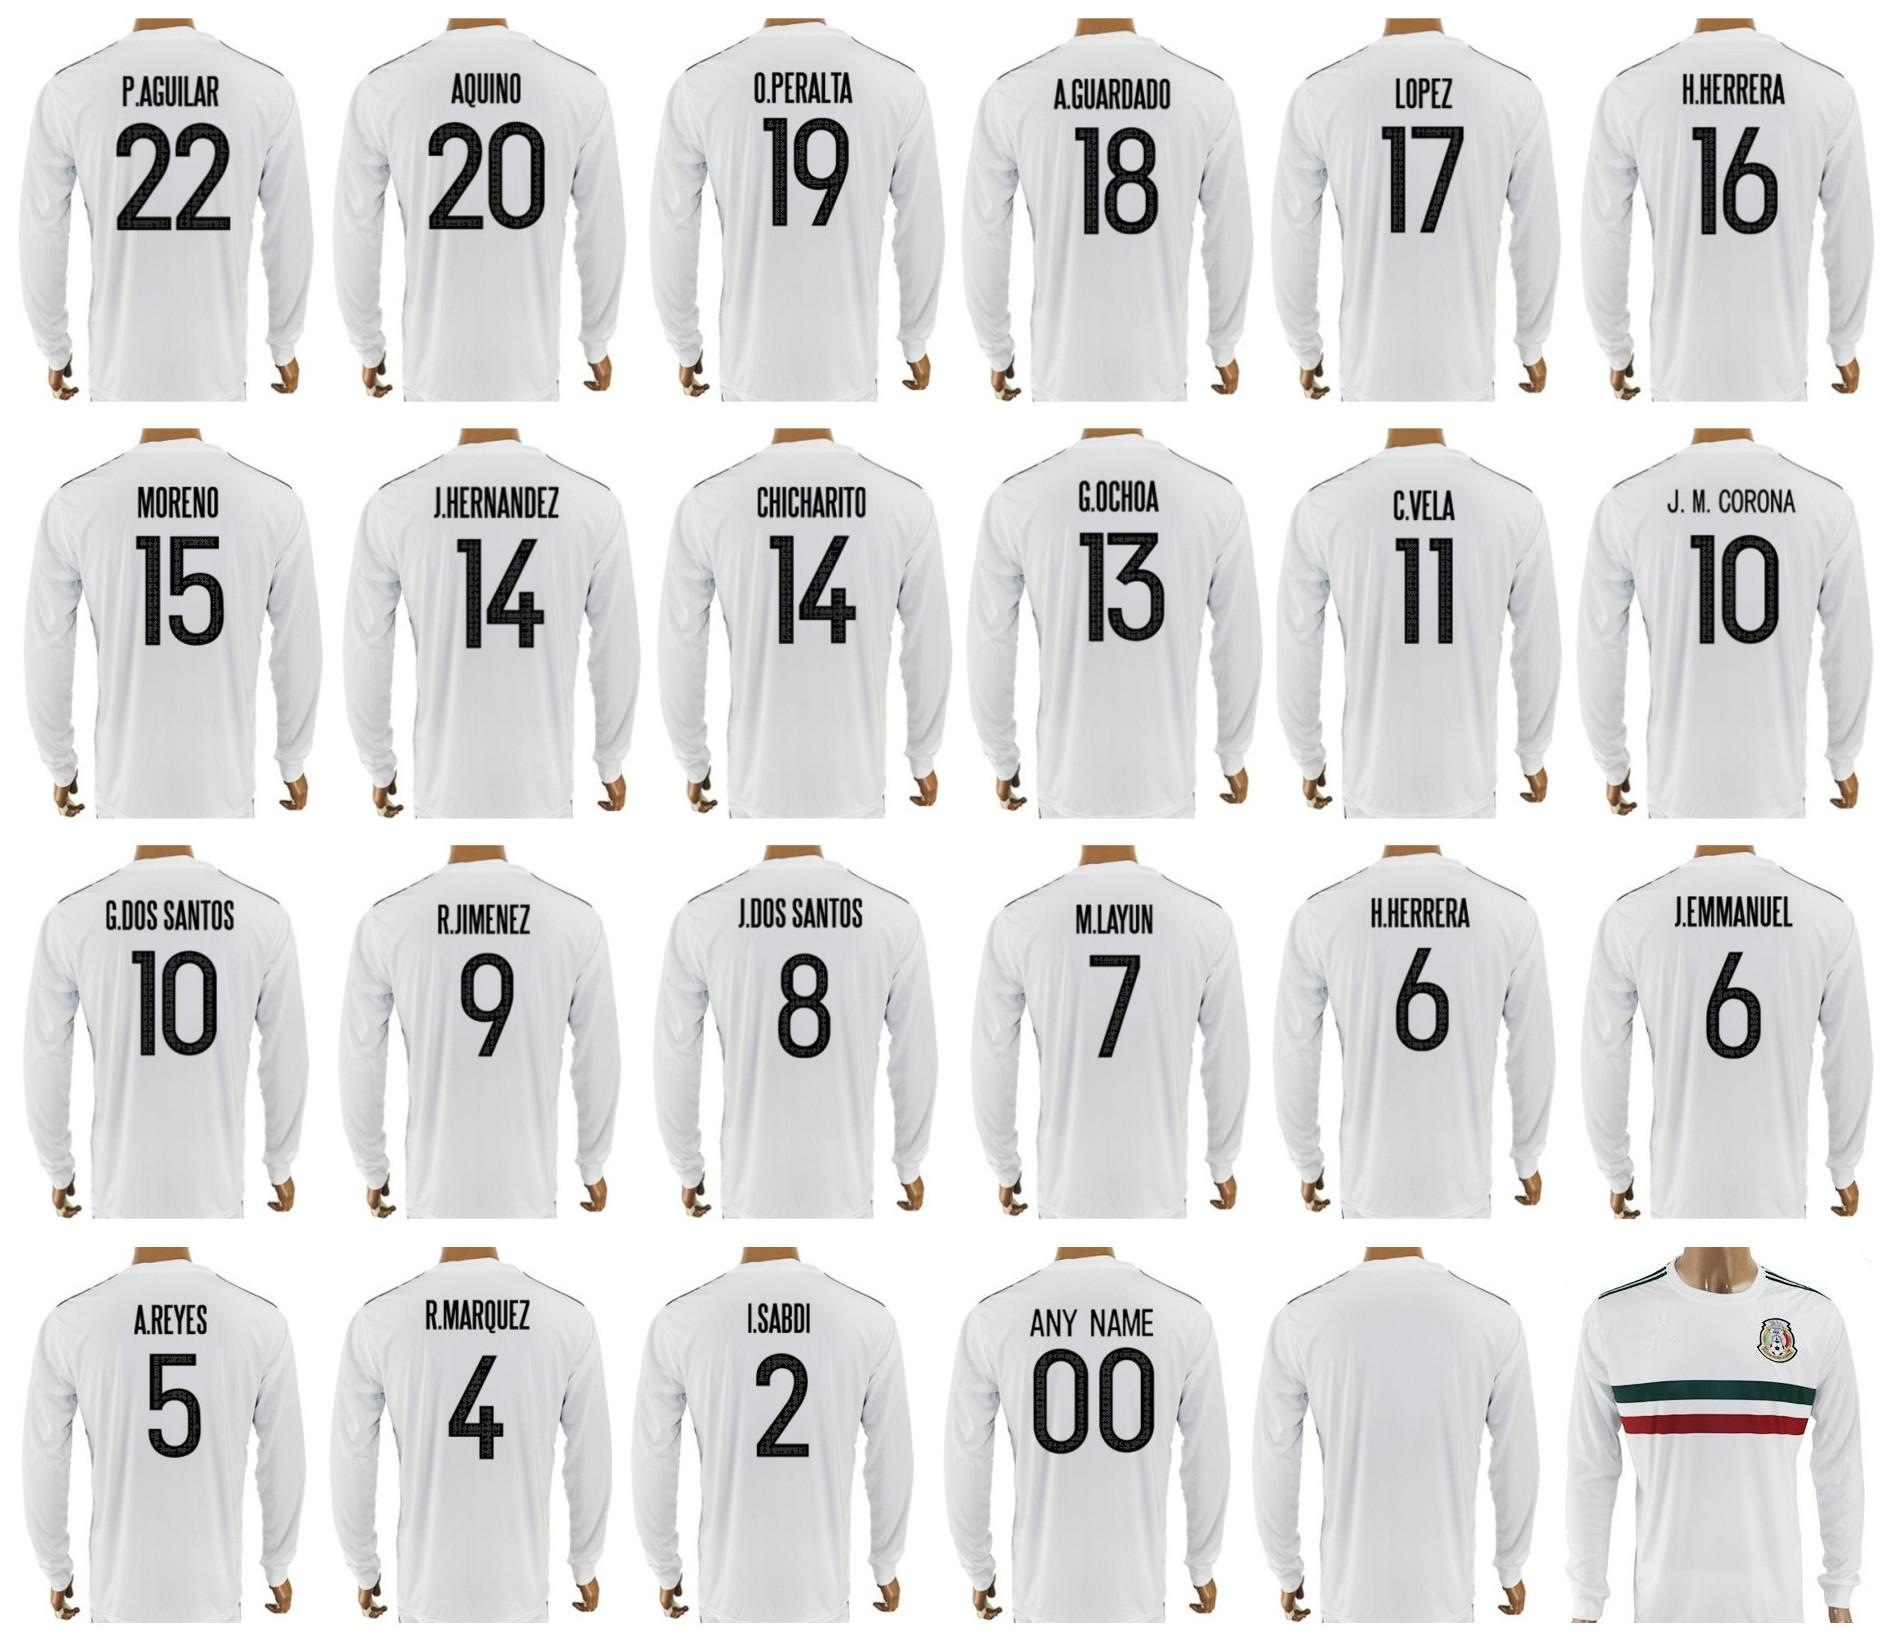 8d25489ca73 ... mexico long sleeve jersey soccer 2017 2018 mexican 10 giovani dos  santos 14 javier hernandez 18